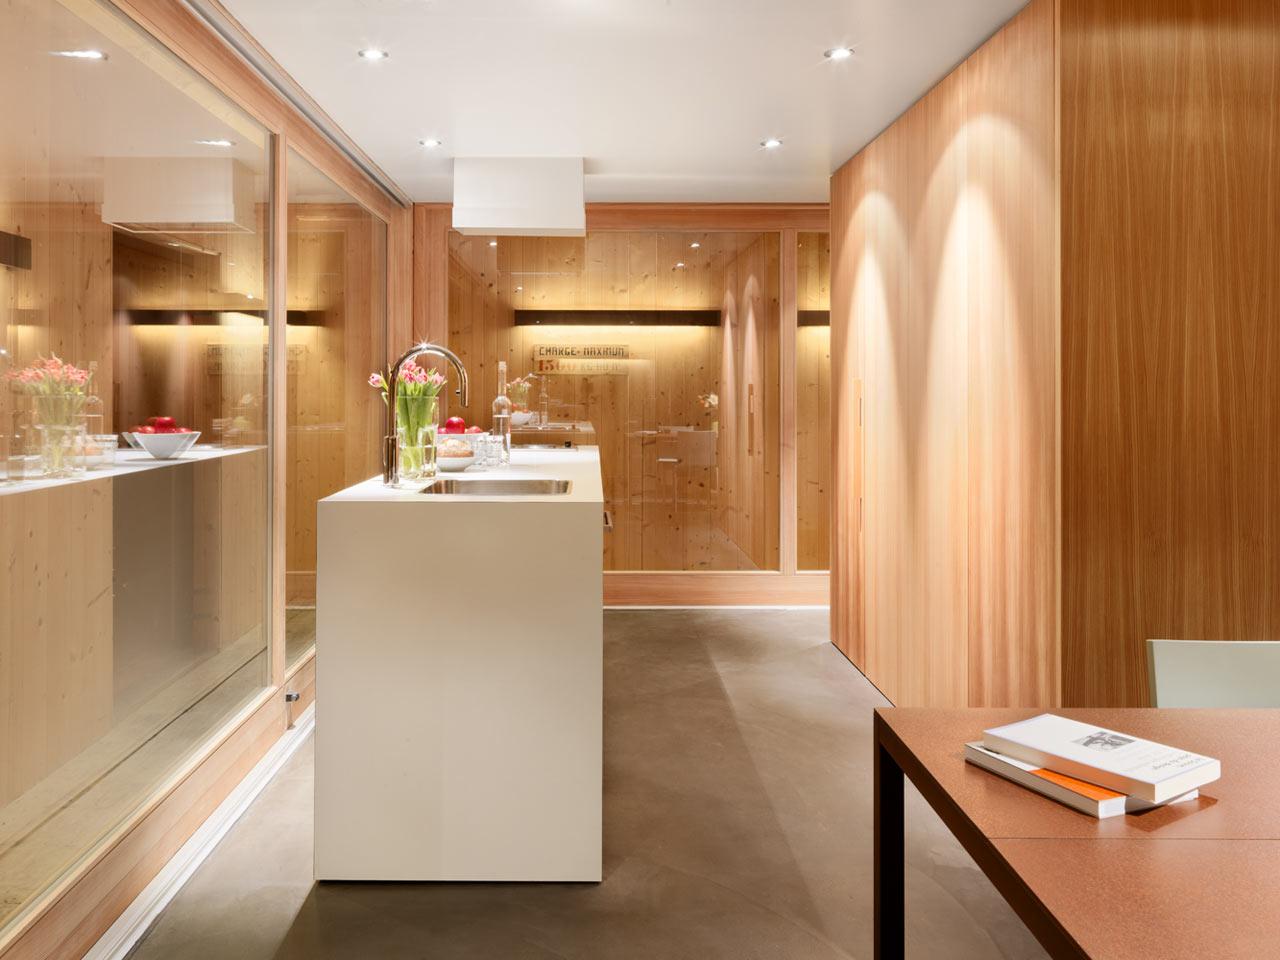 Arsenal-B47-Ralph-Germann-architectes-14-kitchen